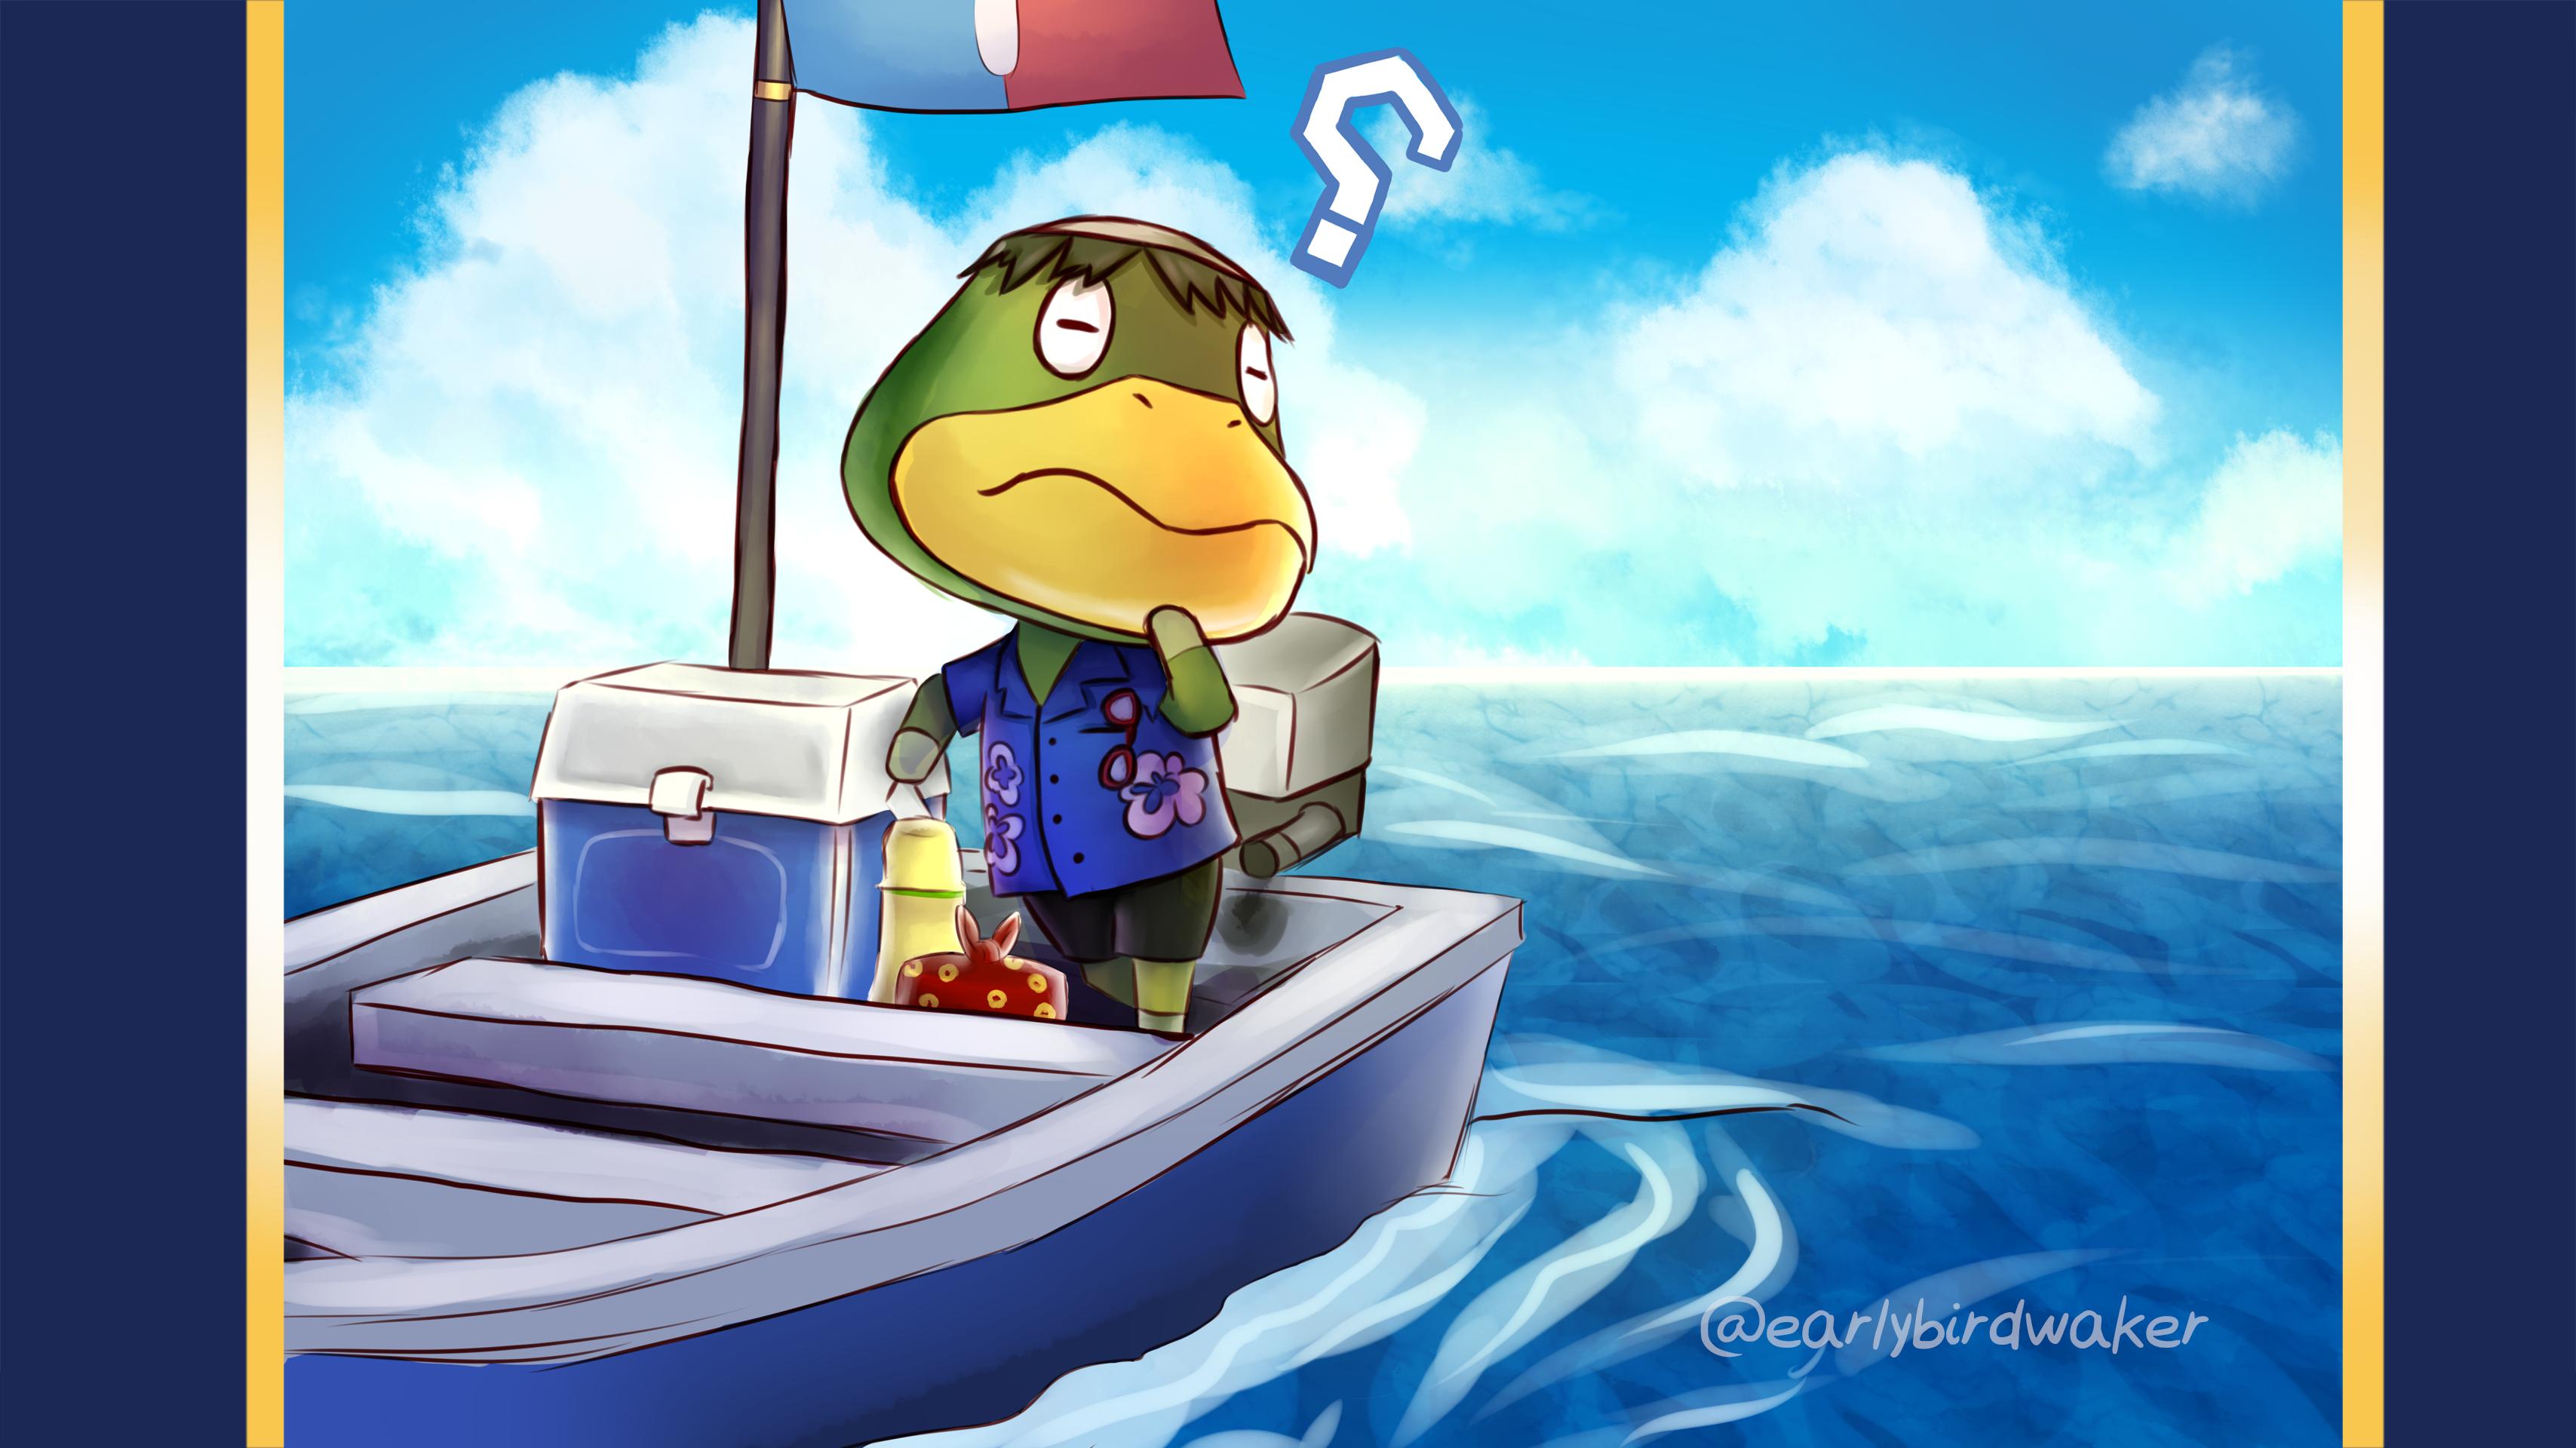 Kapp N Wallpaper Animal Crossing New Leaf By Earlybirdwaker On